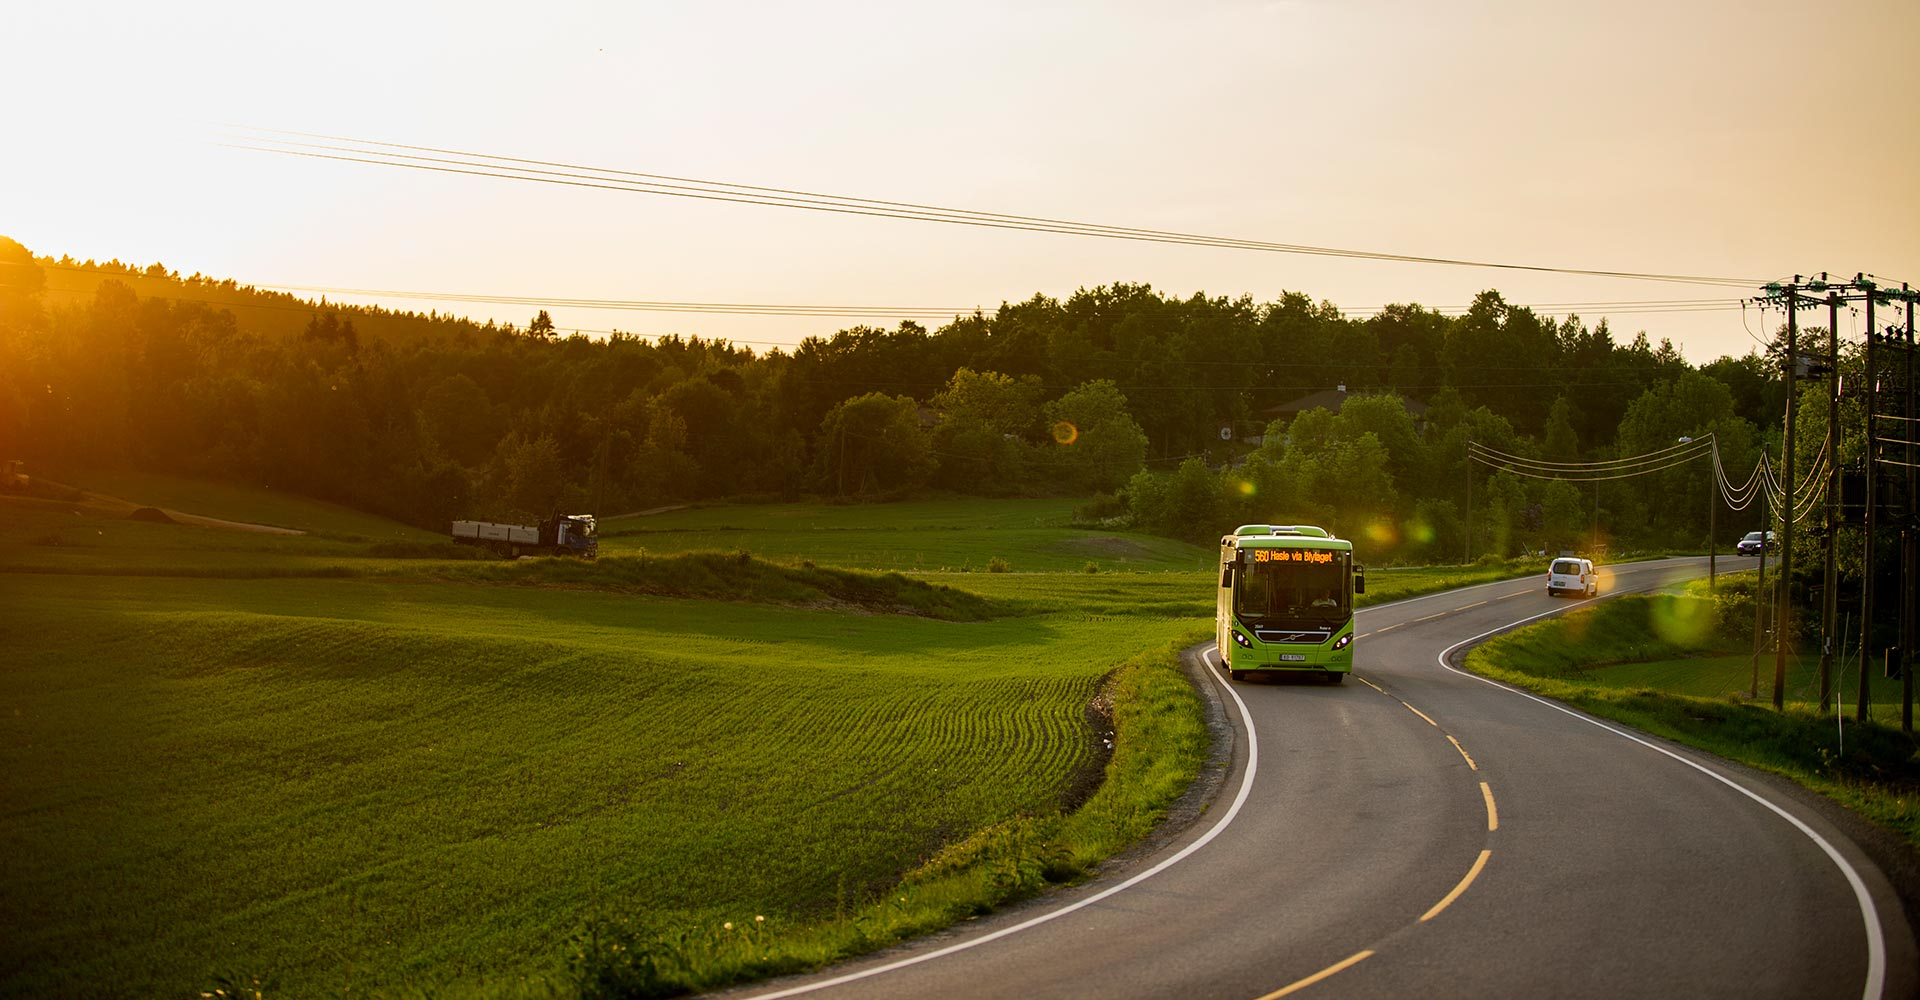 Bilde av Ruter regionsbuss i landelig omgivelser